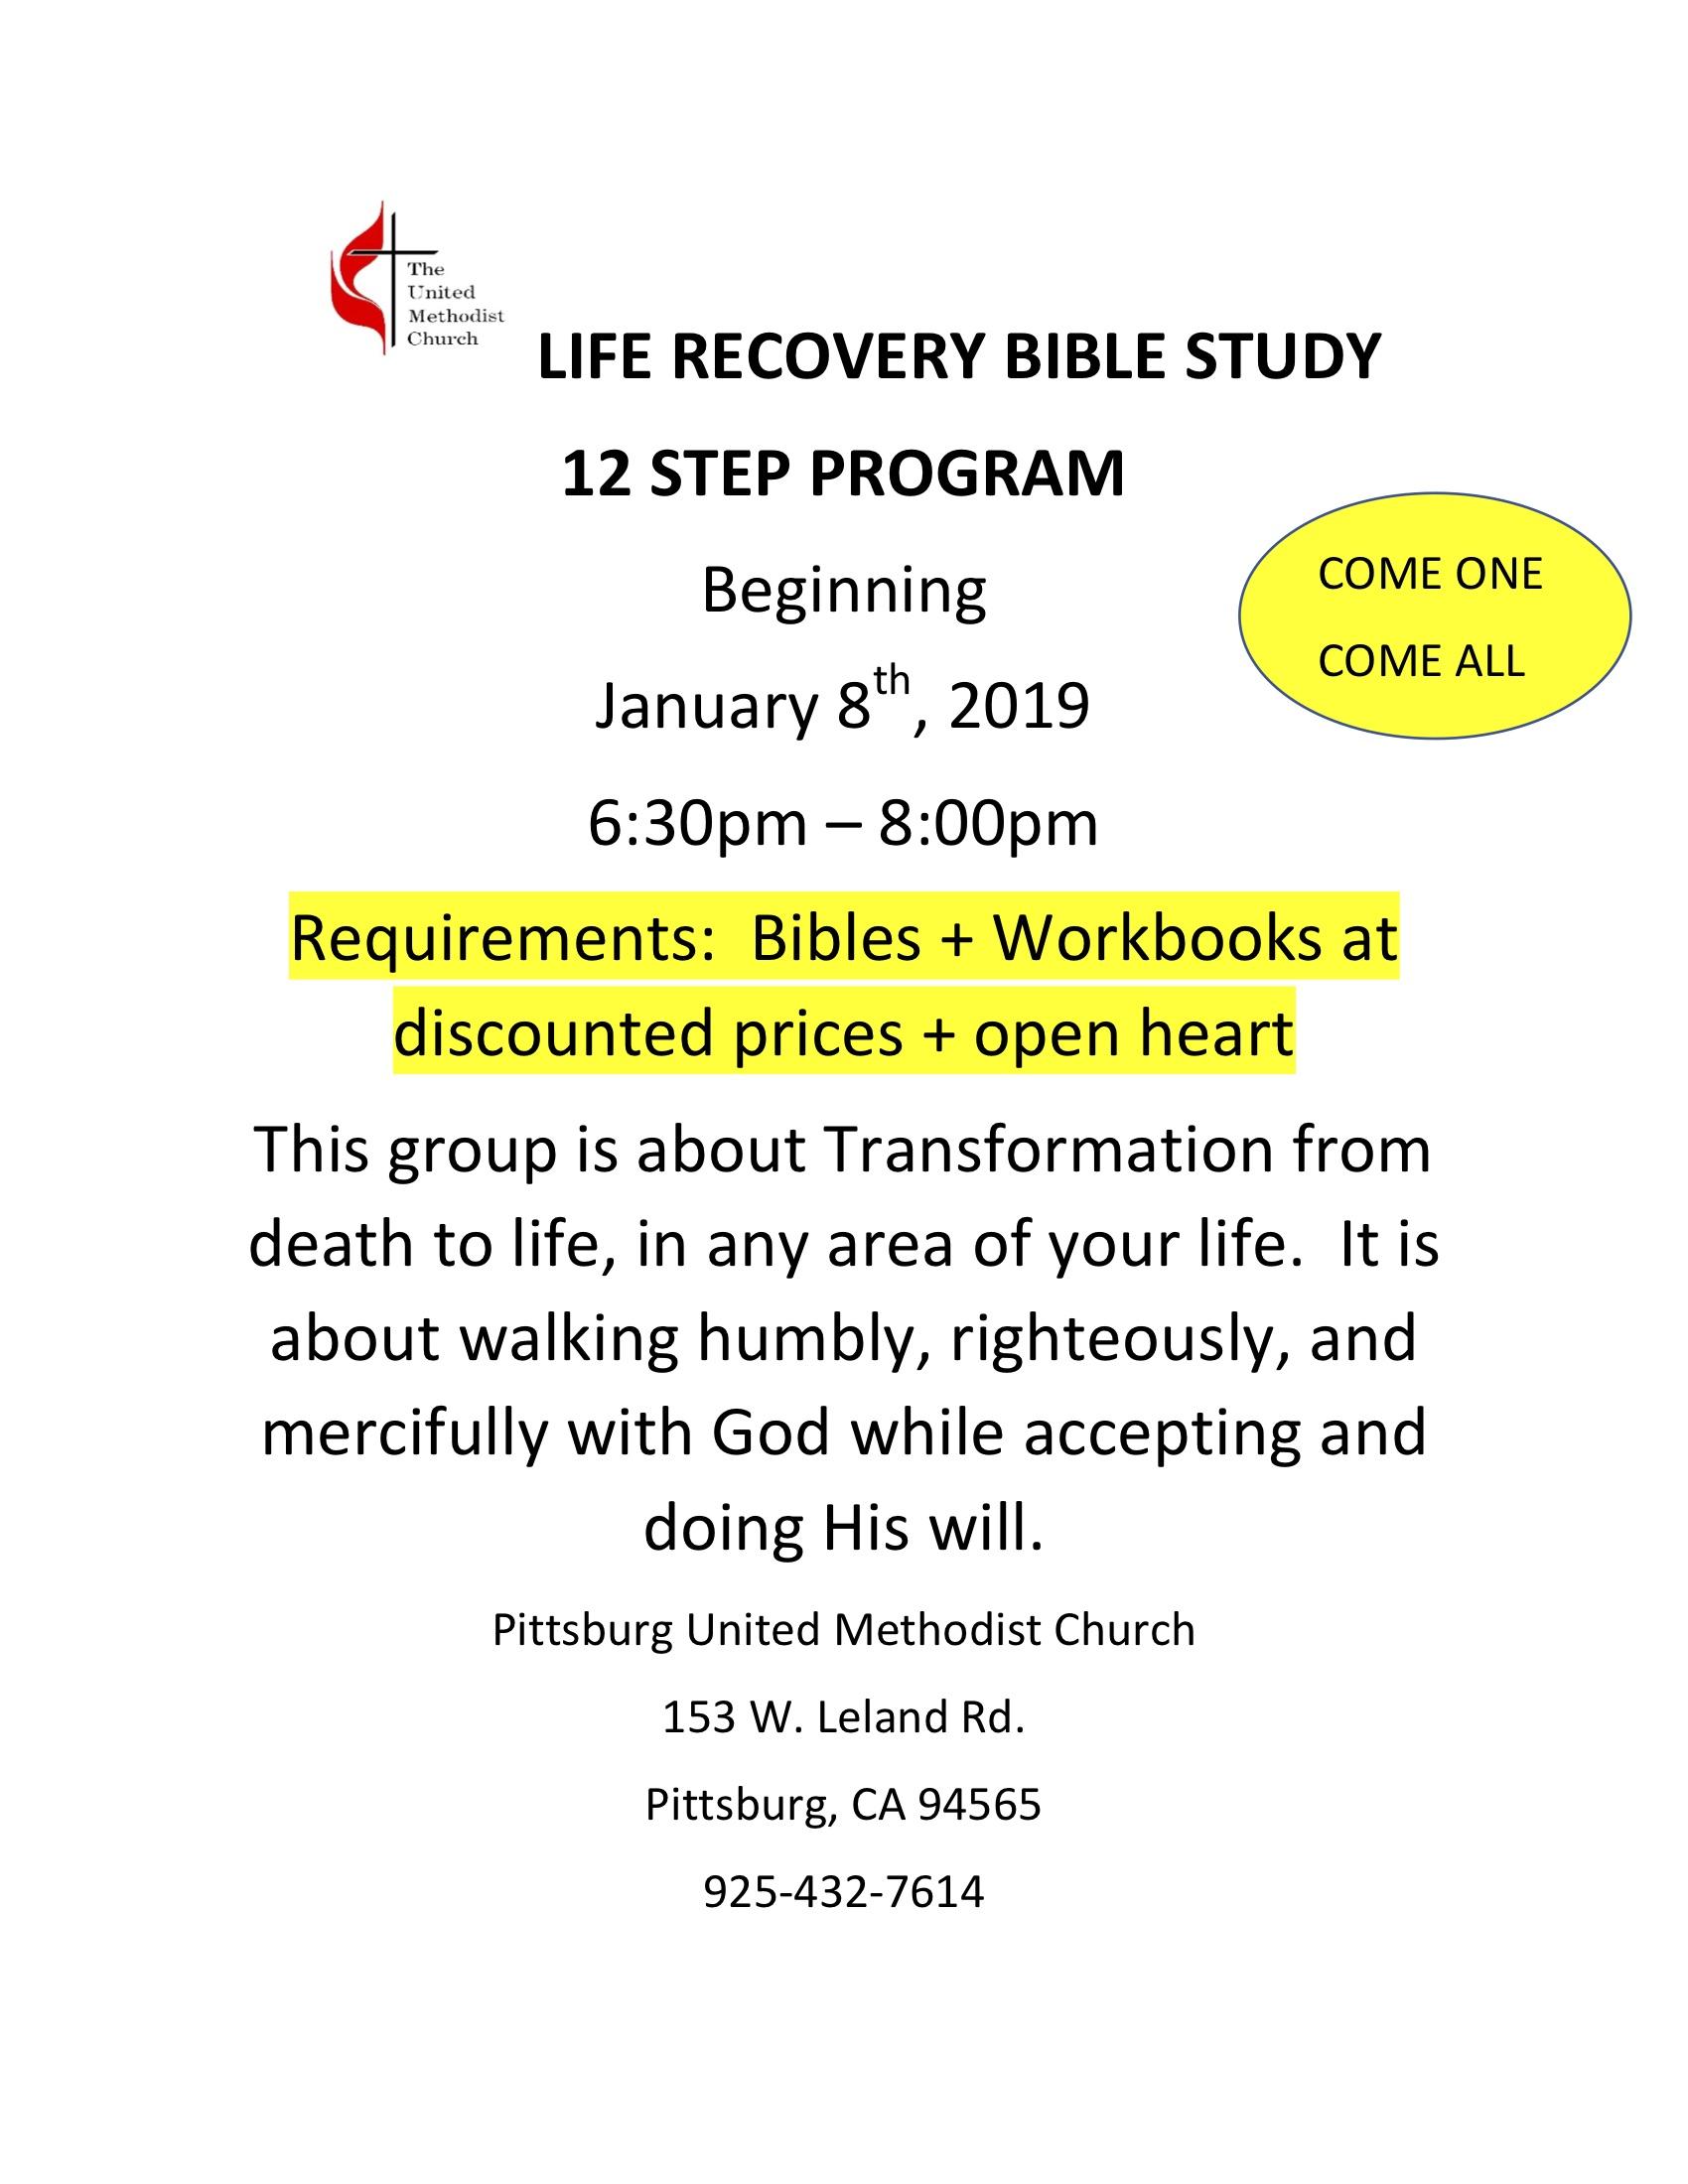 Life Recovery Bible Study 12 Step Program The Interfaith